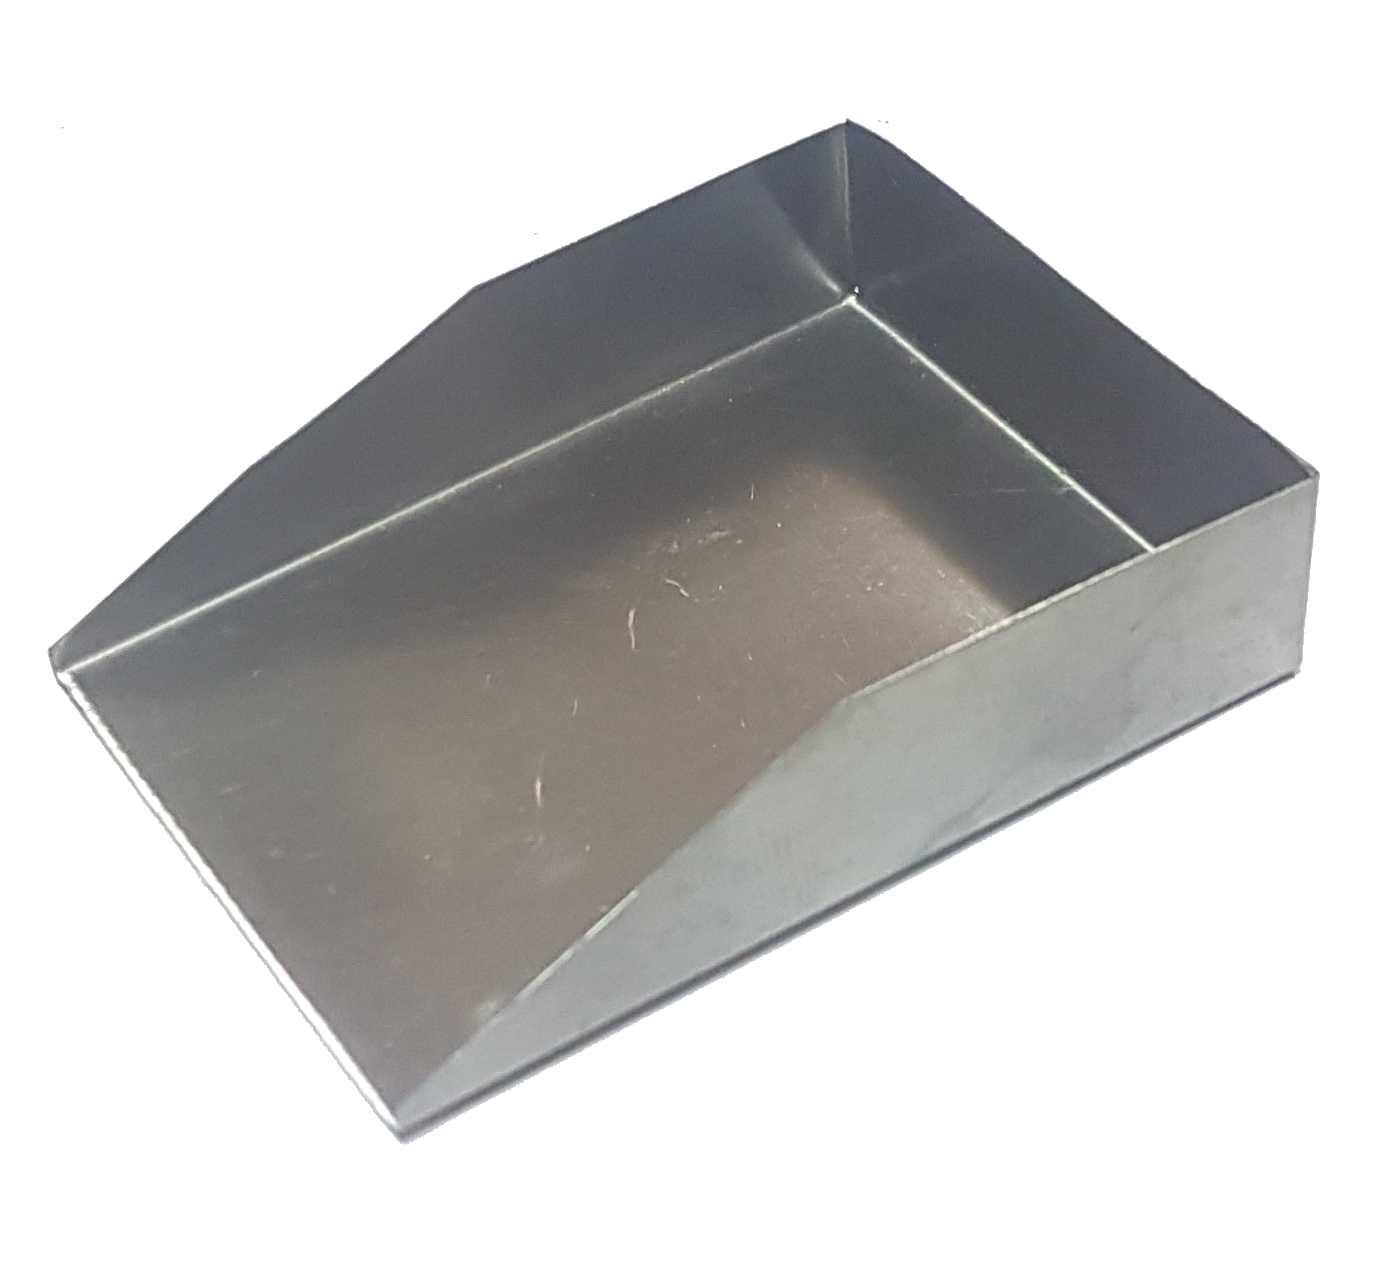 2,30€ Recogedora limadura rectangular 60x45mm